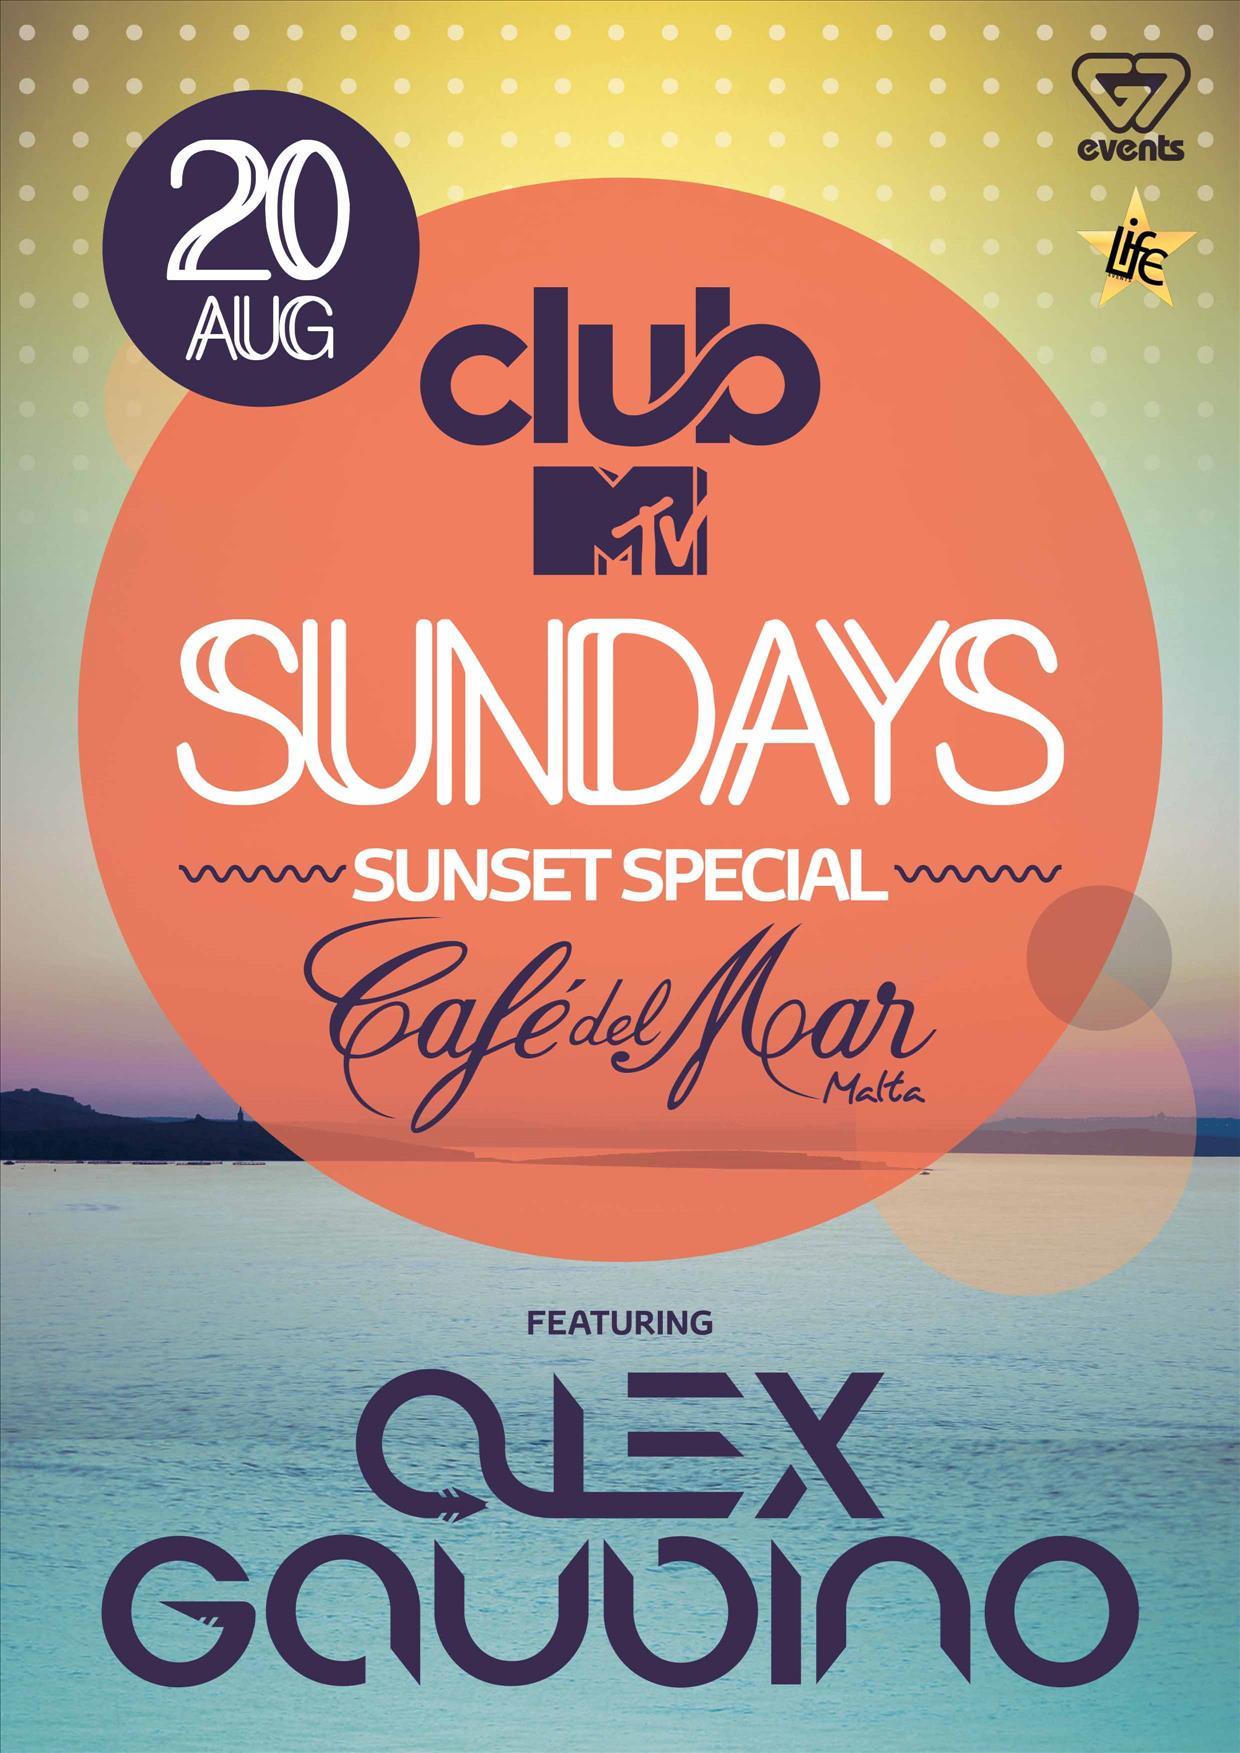 Club MTV Sundays present ALEX GAUDINO flyer